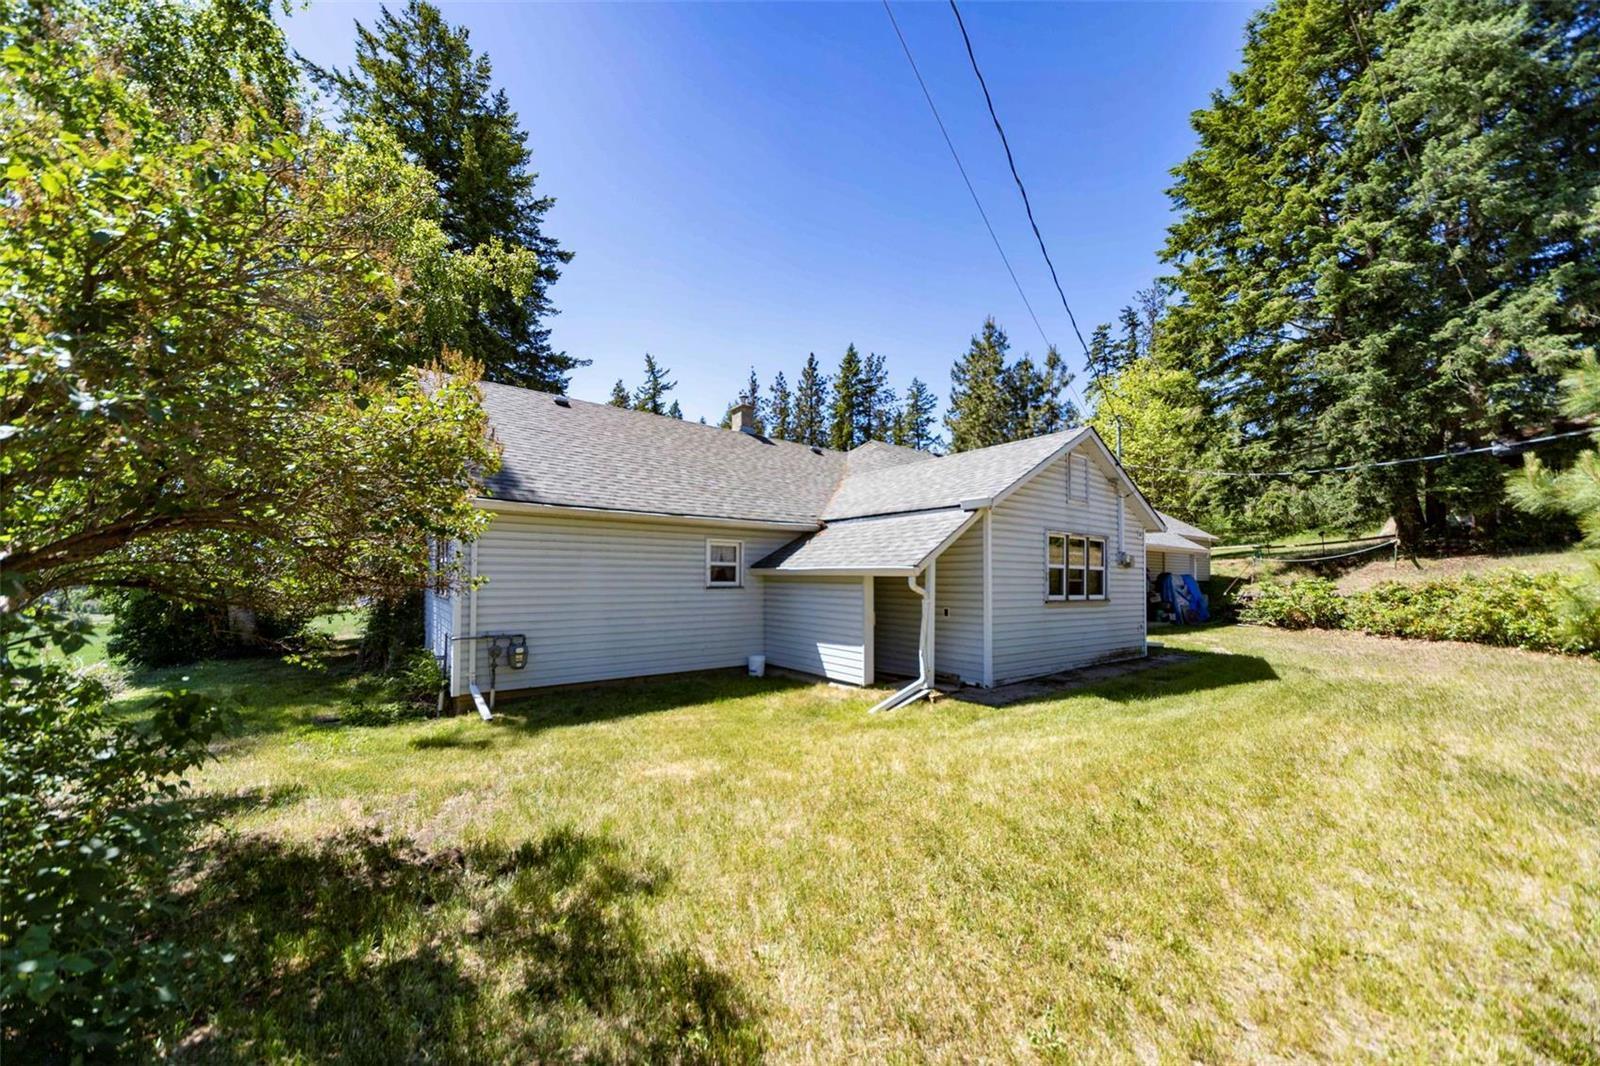 4602 Schubert Road,, Armstrong, British Columbia  V0E 1B4 - Photo 9 - 10232684